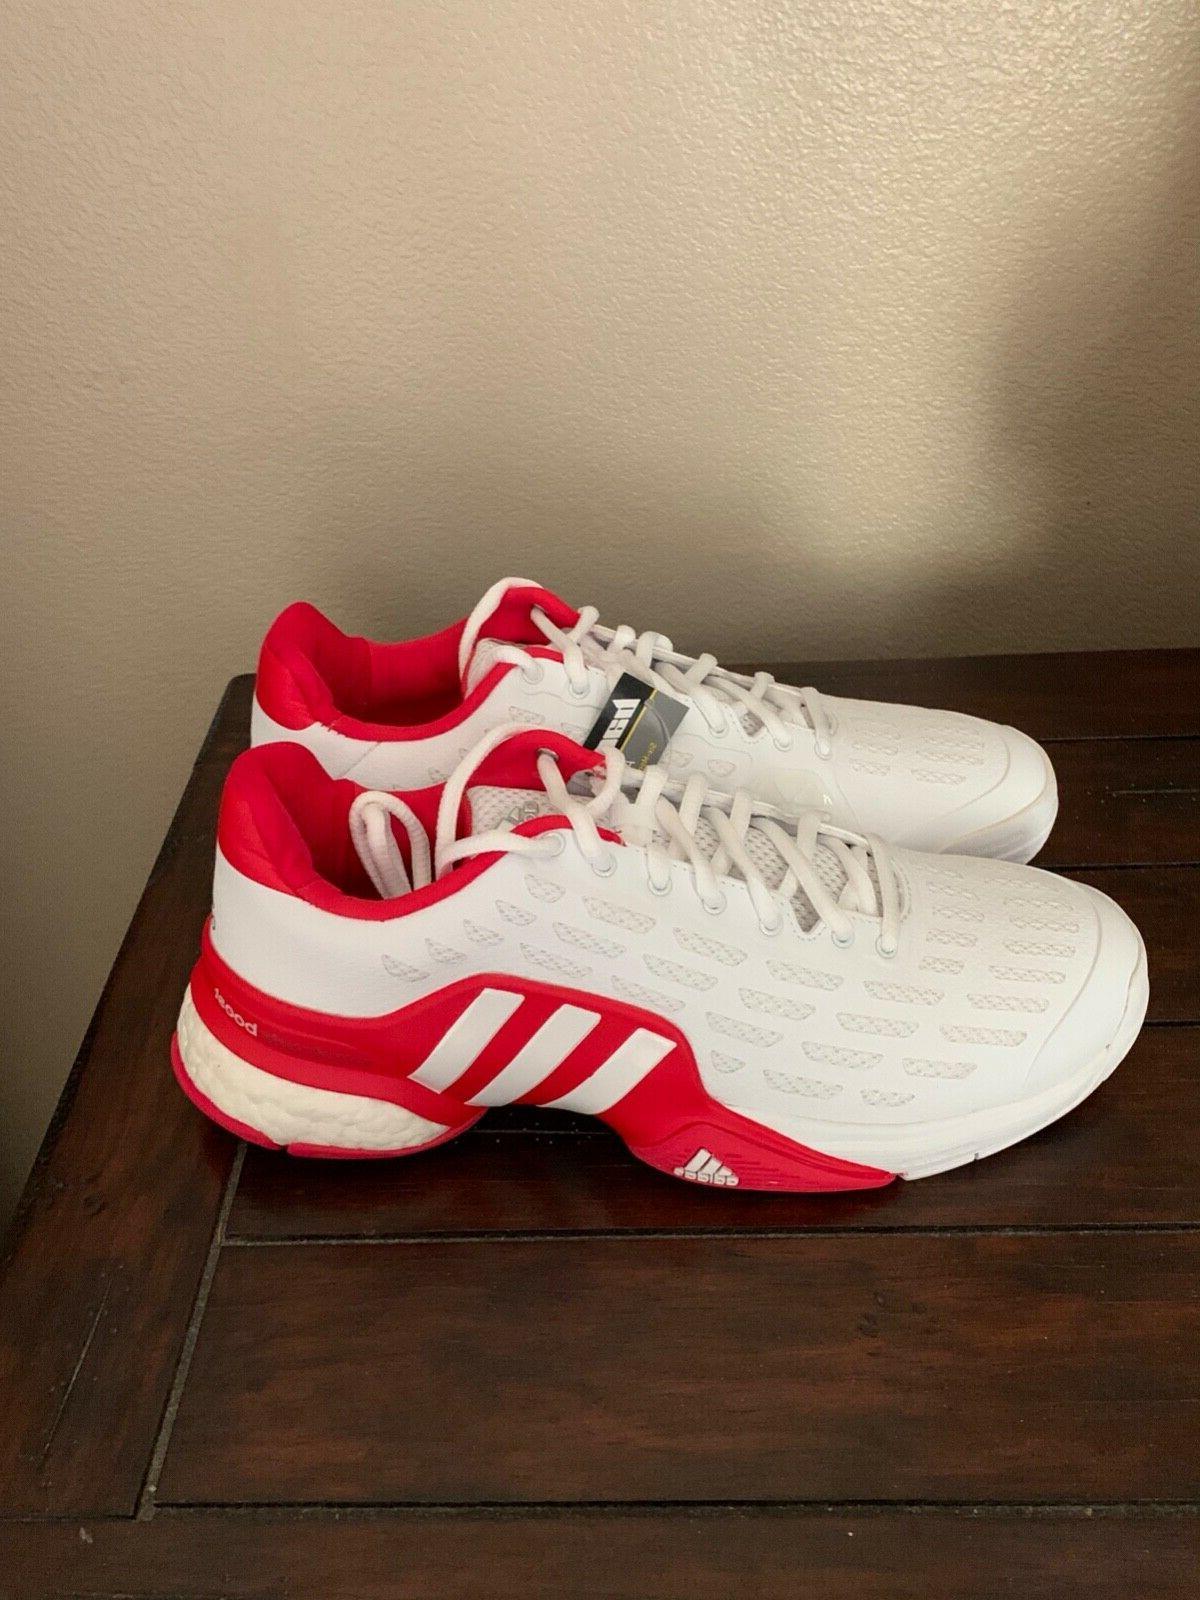 Adidas Boost Tennis AQ2262 Size